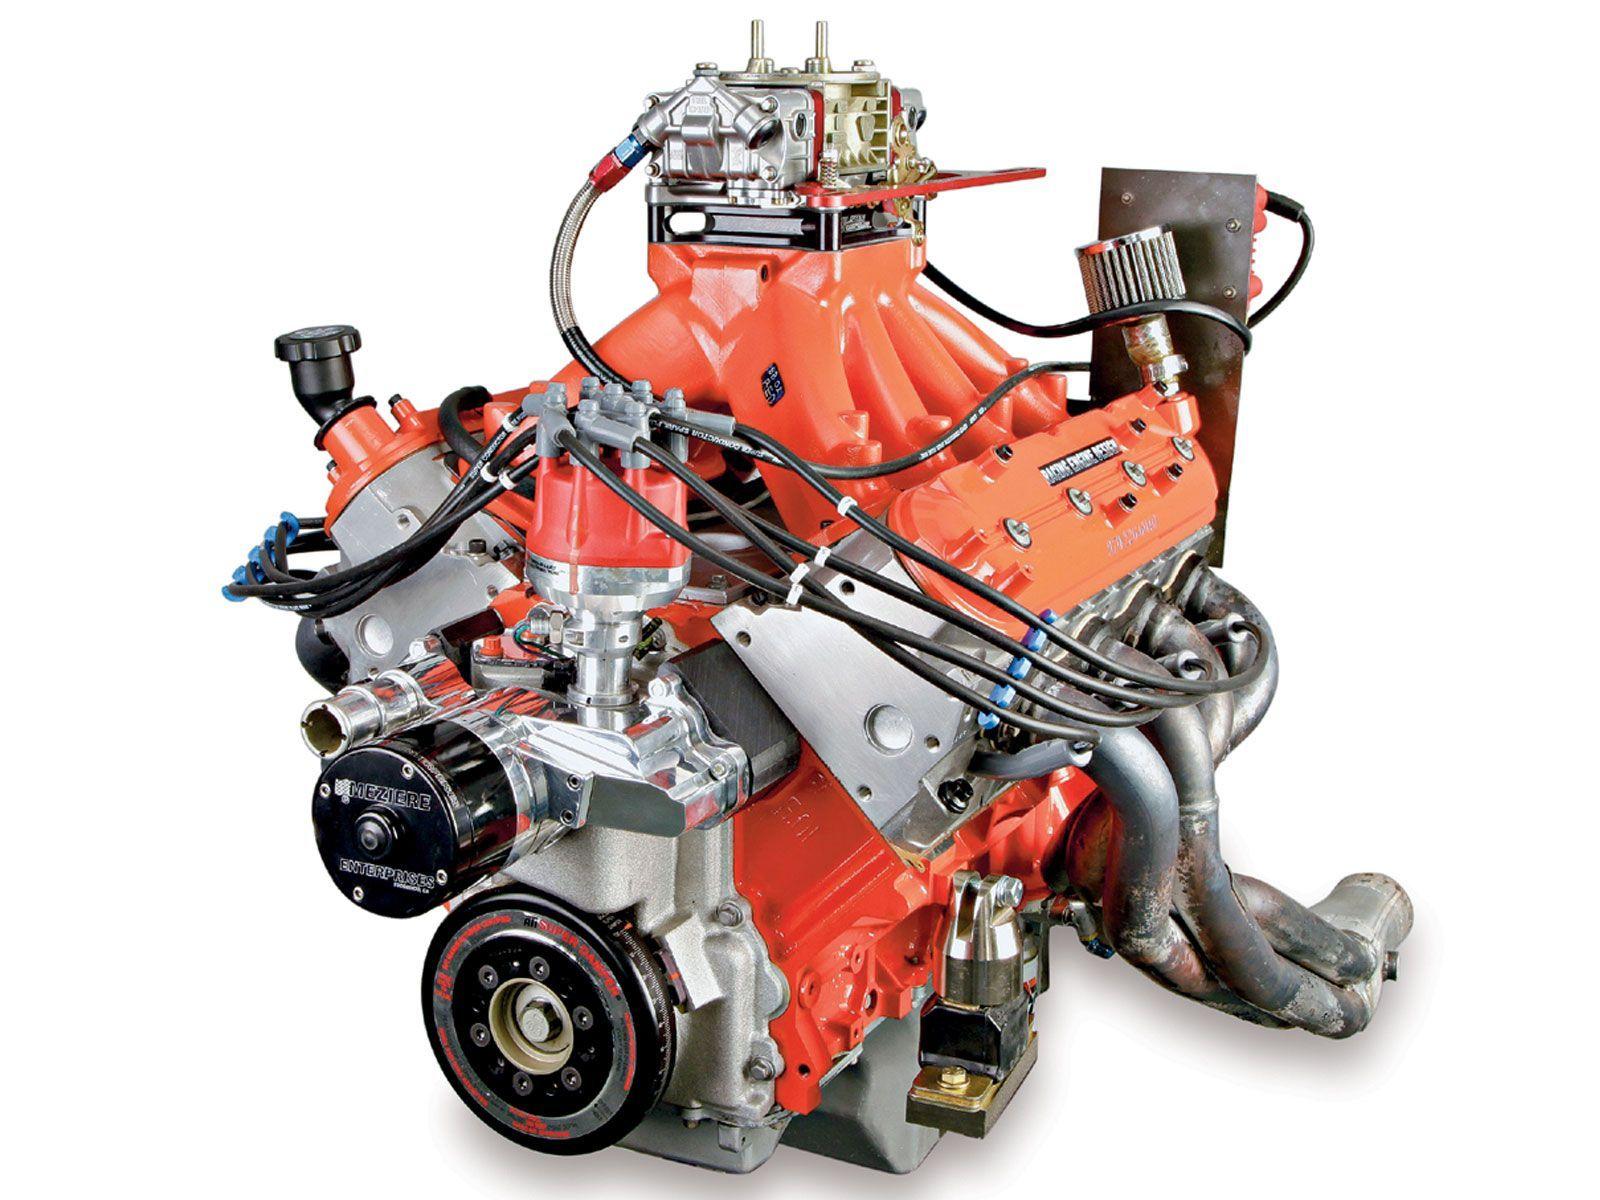 1003phr 01 O Racing Engine Design 370 Gen Iii Chevrolet Ls Engine Completed Engine Jpg 1600 1200 Car Engine Engineering Car